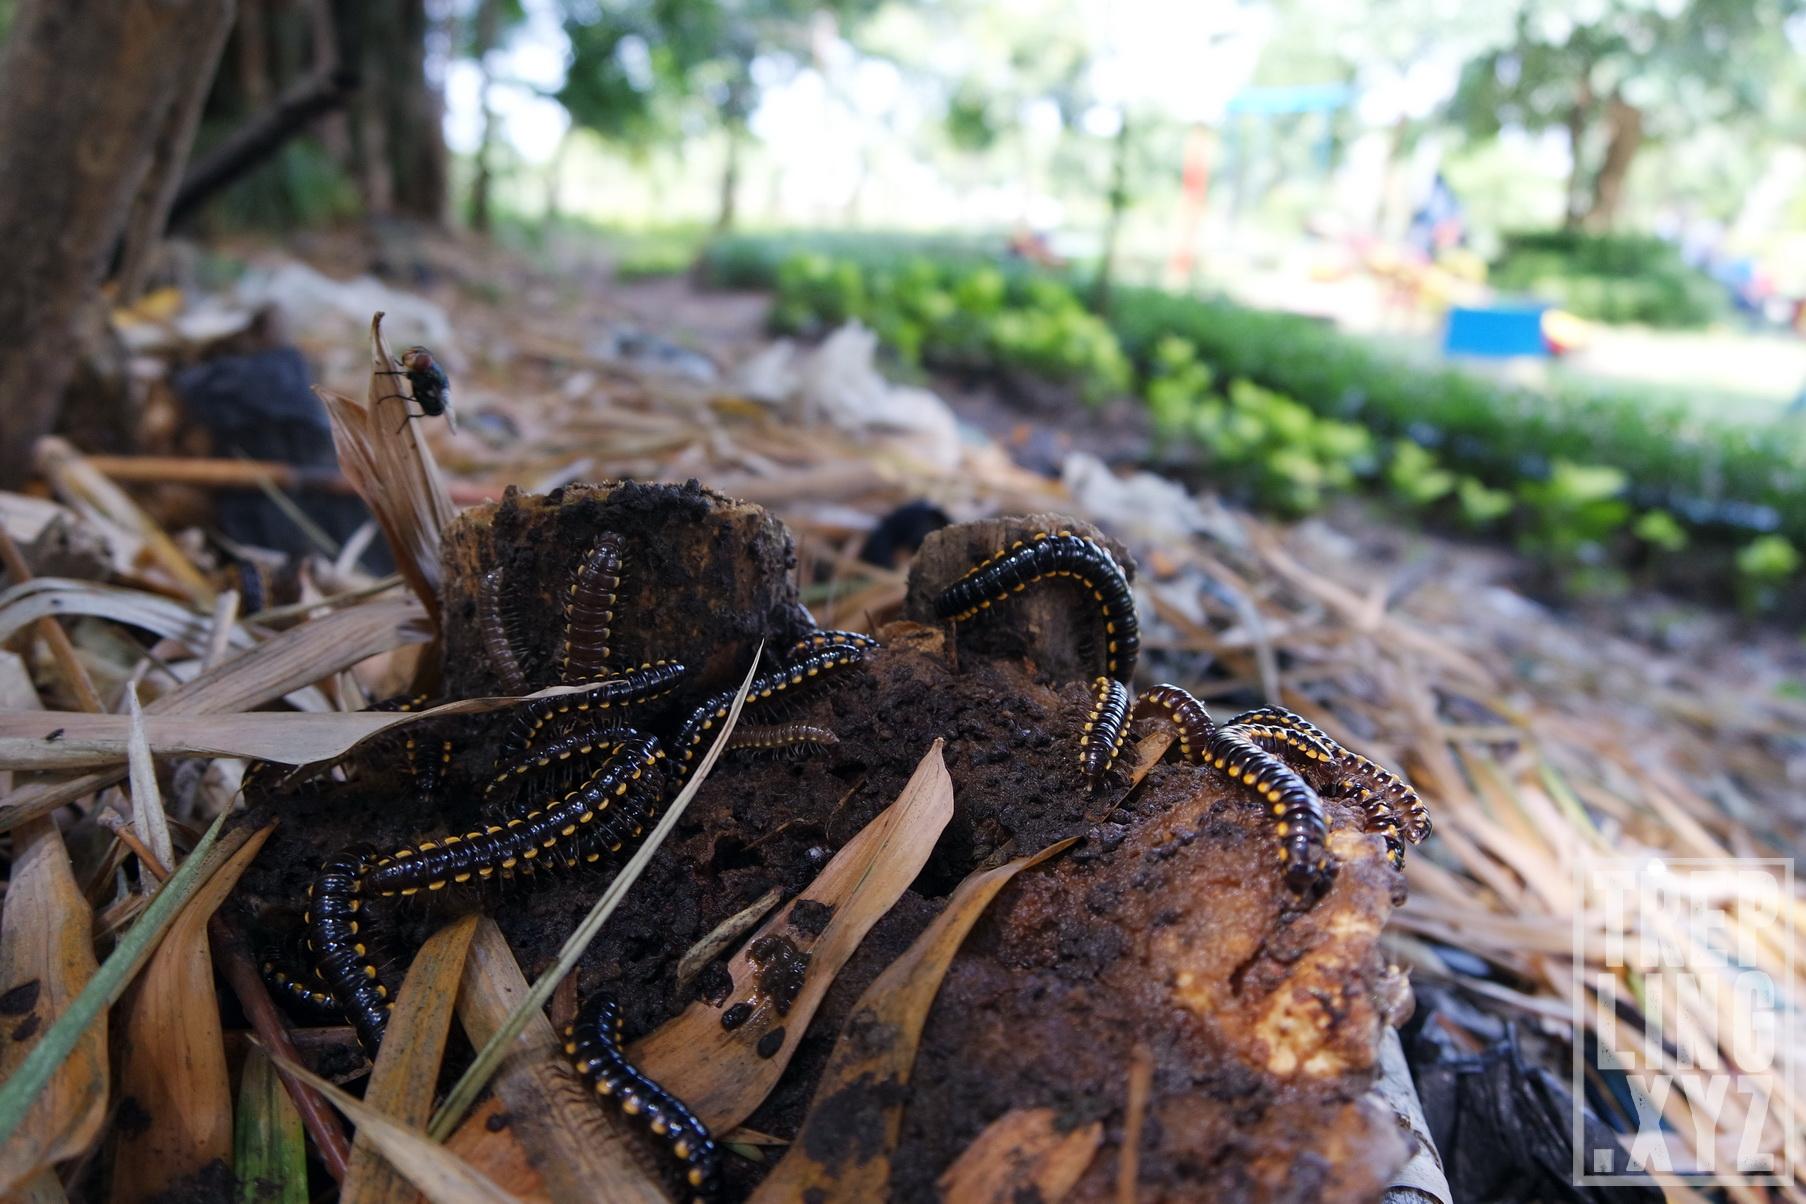 Wisata Alam Hutan Bambu Taman Sakura Keputih Surabaya Penunggu Jangan